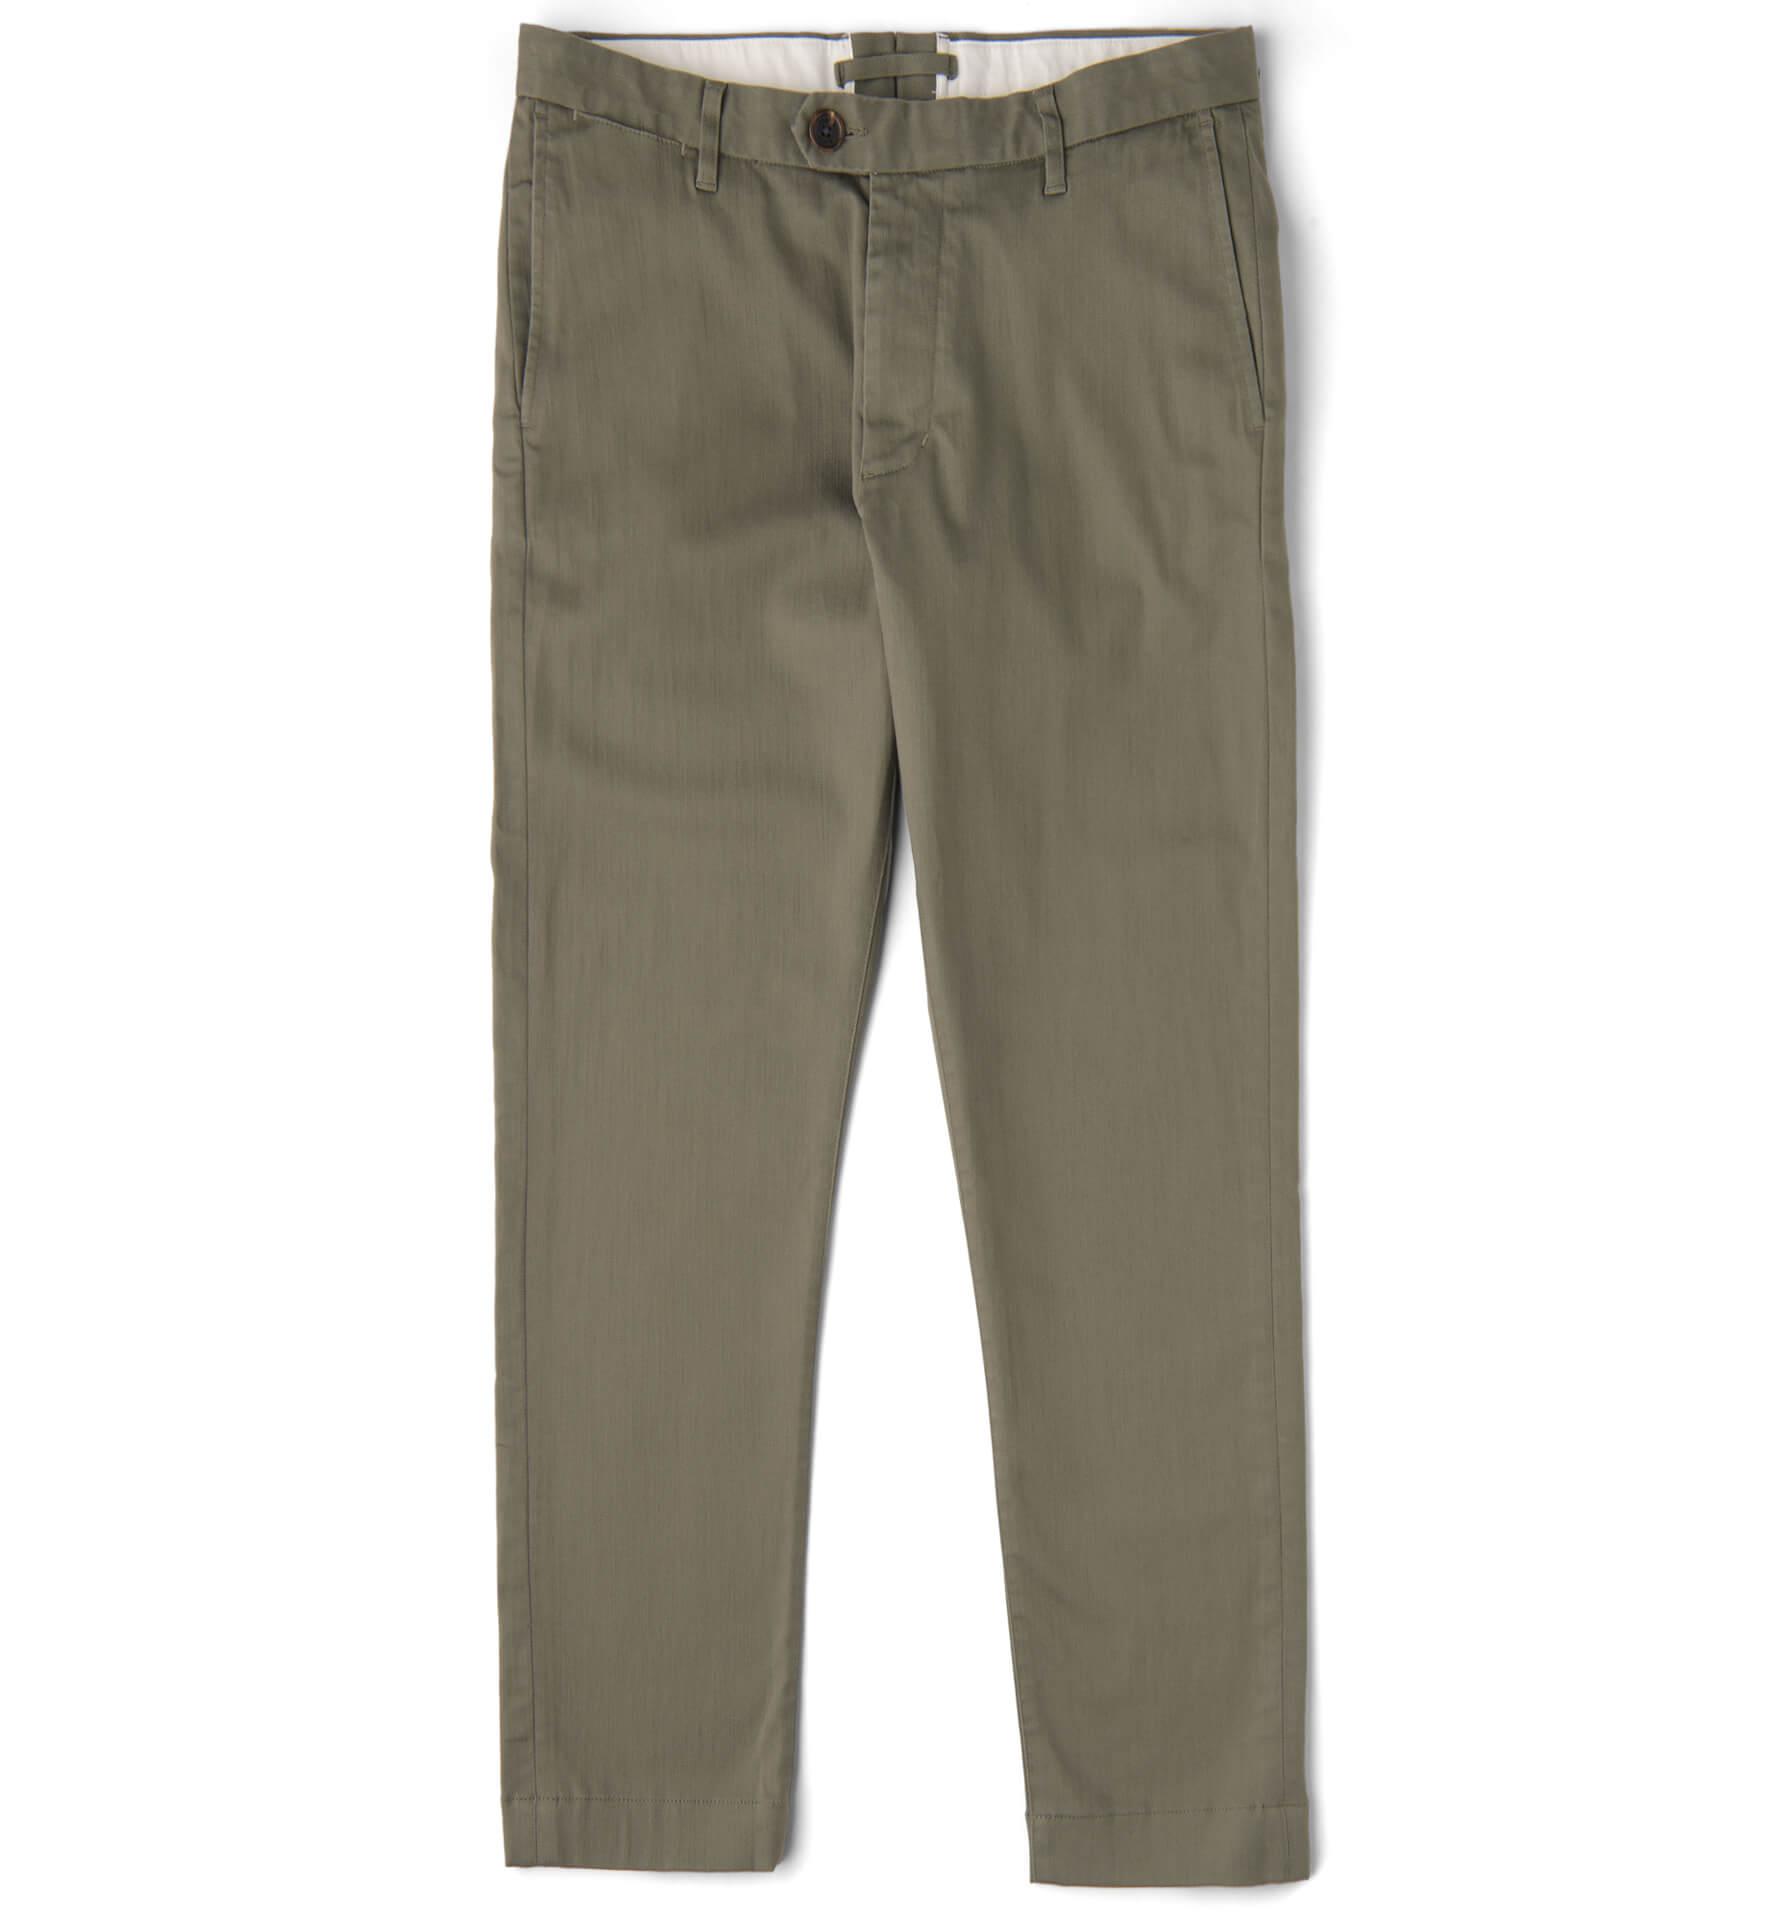 Zoom Image of Bowery Fatigue Cotton and Tencel Slub Twill Chino